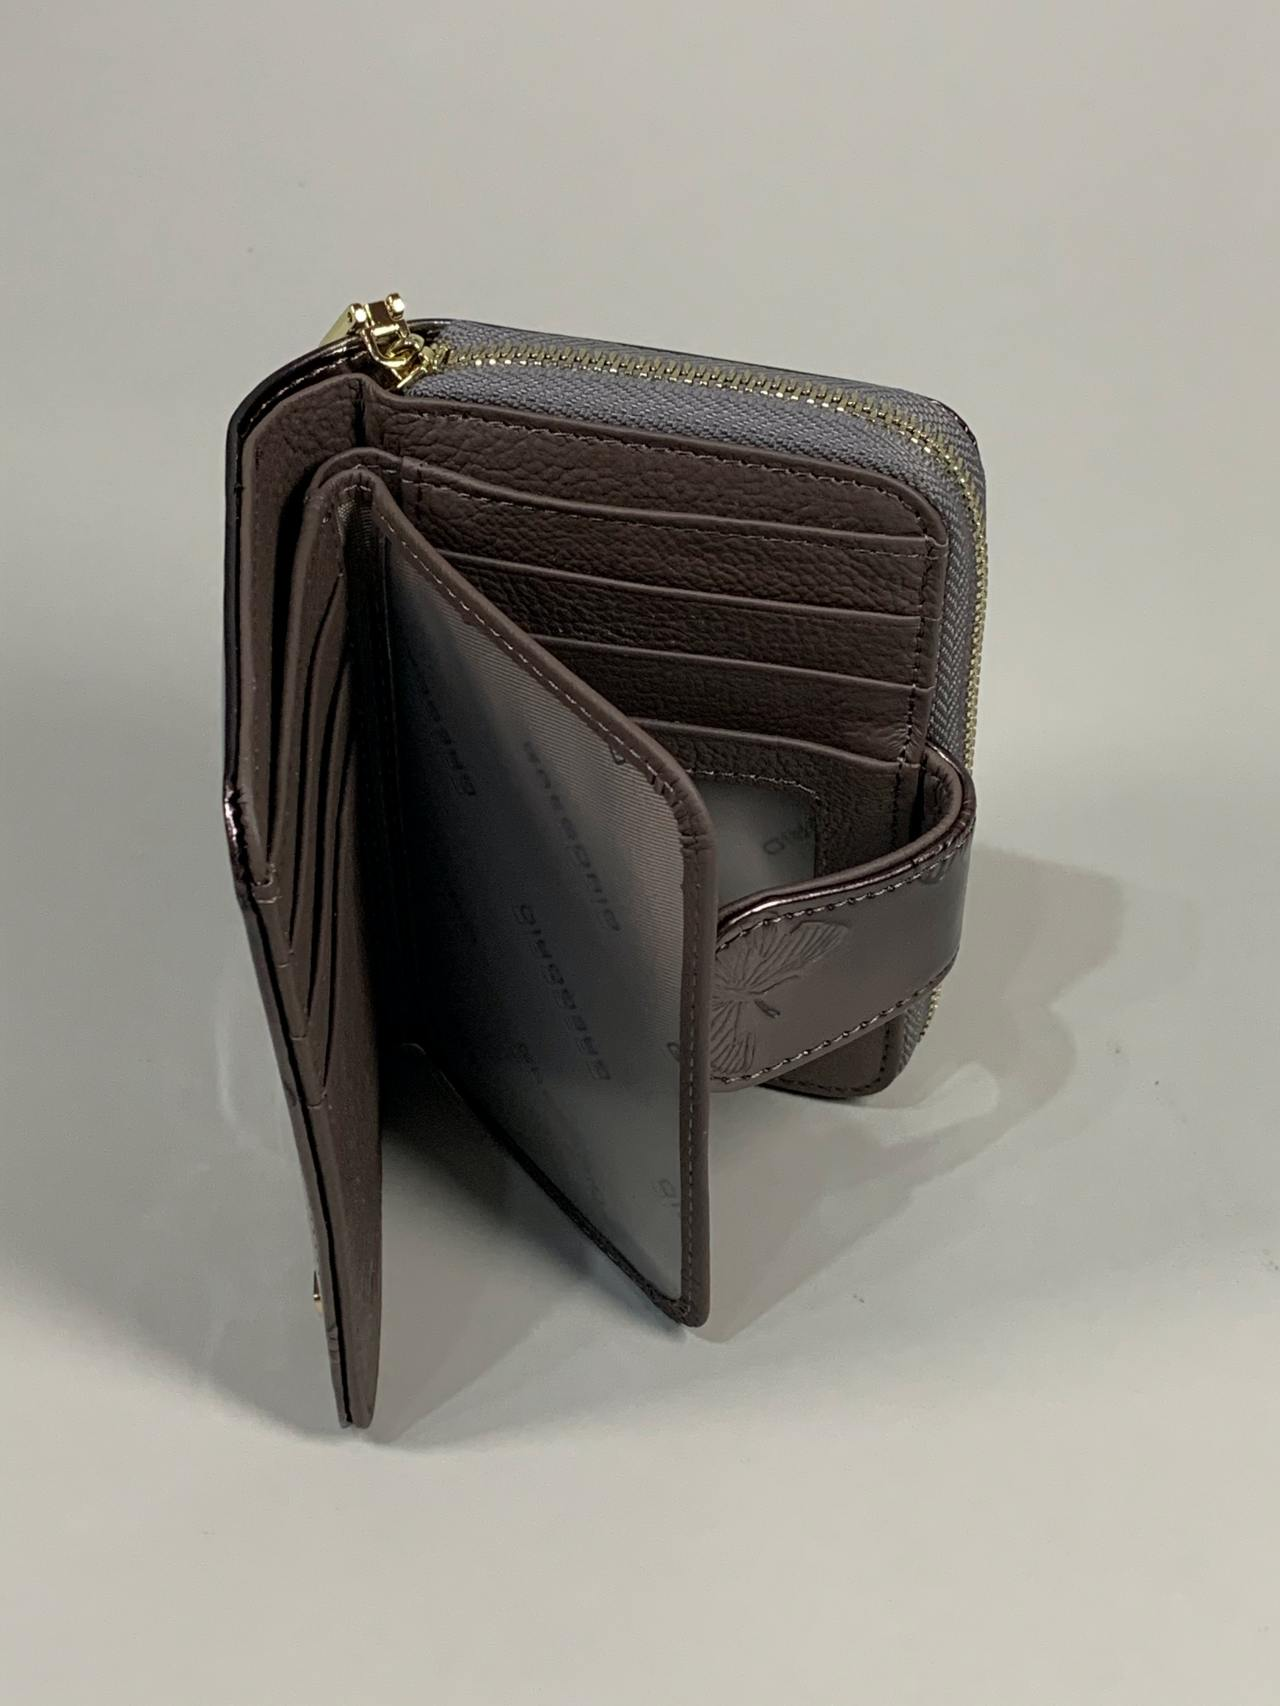 Kožená peněženka Gregorio S šedá s motýly -03